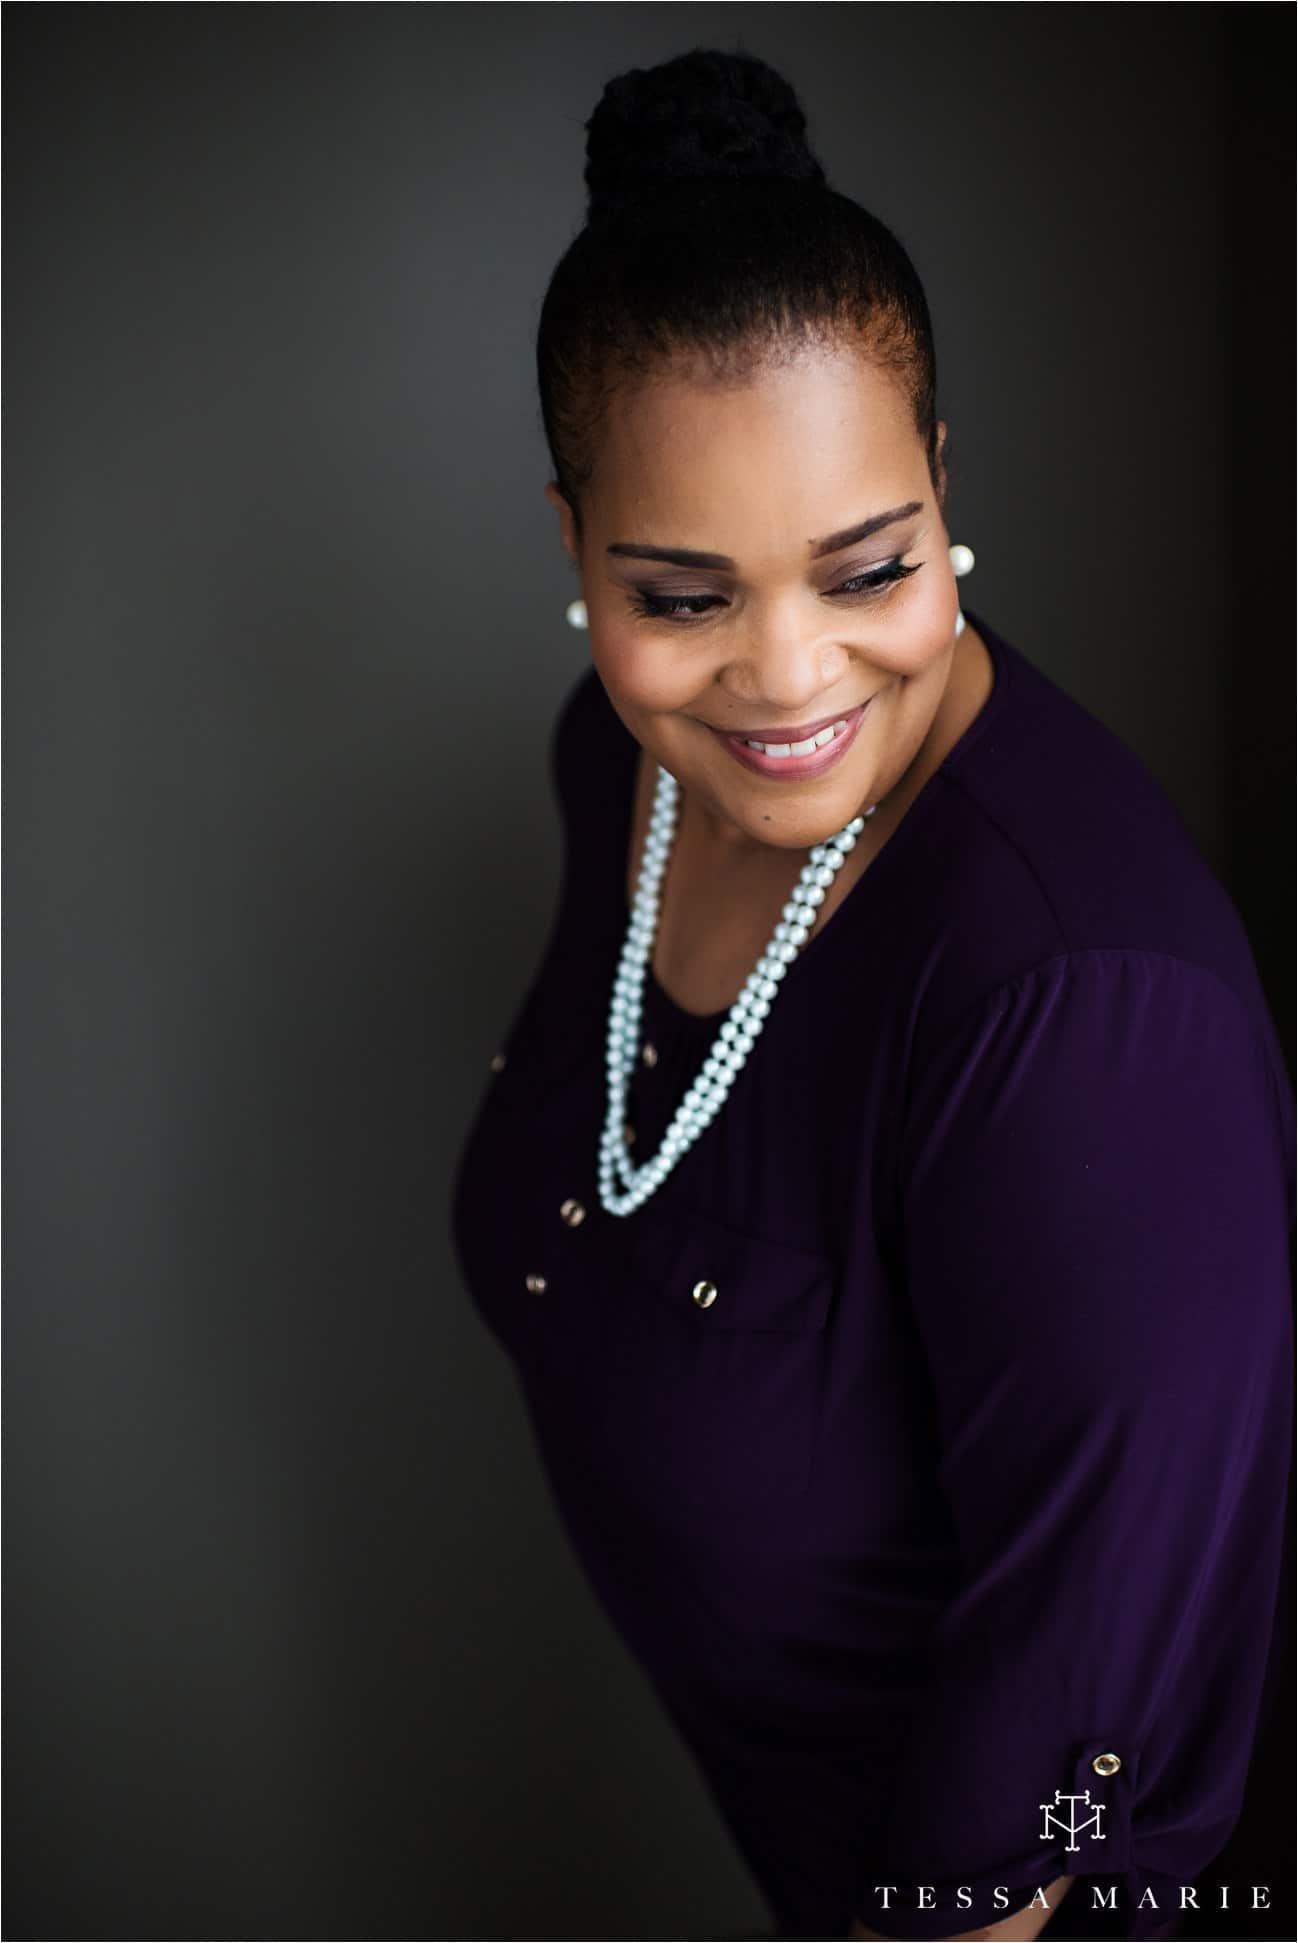 Tessa_marie_studios_womens_headshots_portraits_empowering_full_experience_something_for_mom_0044